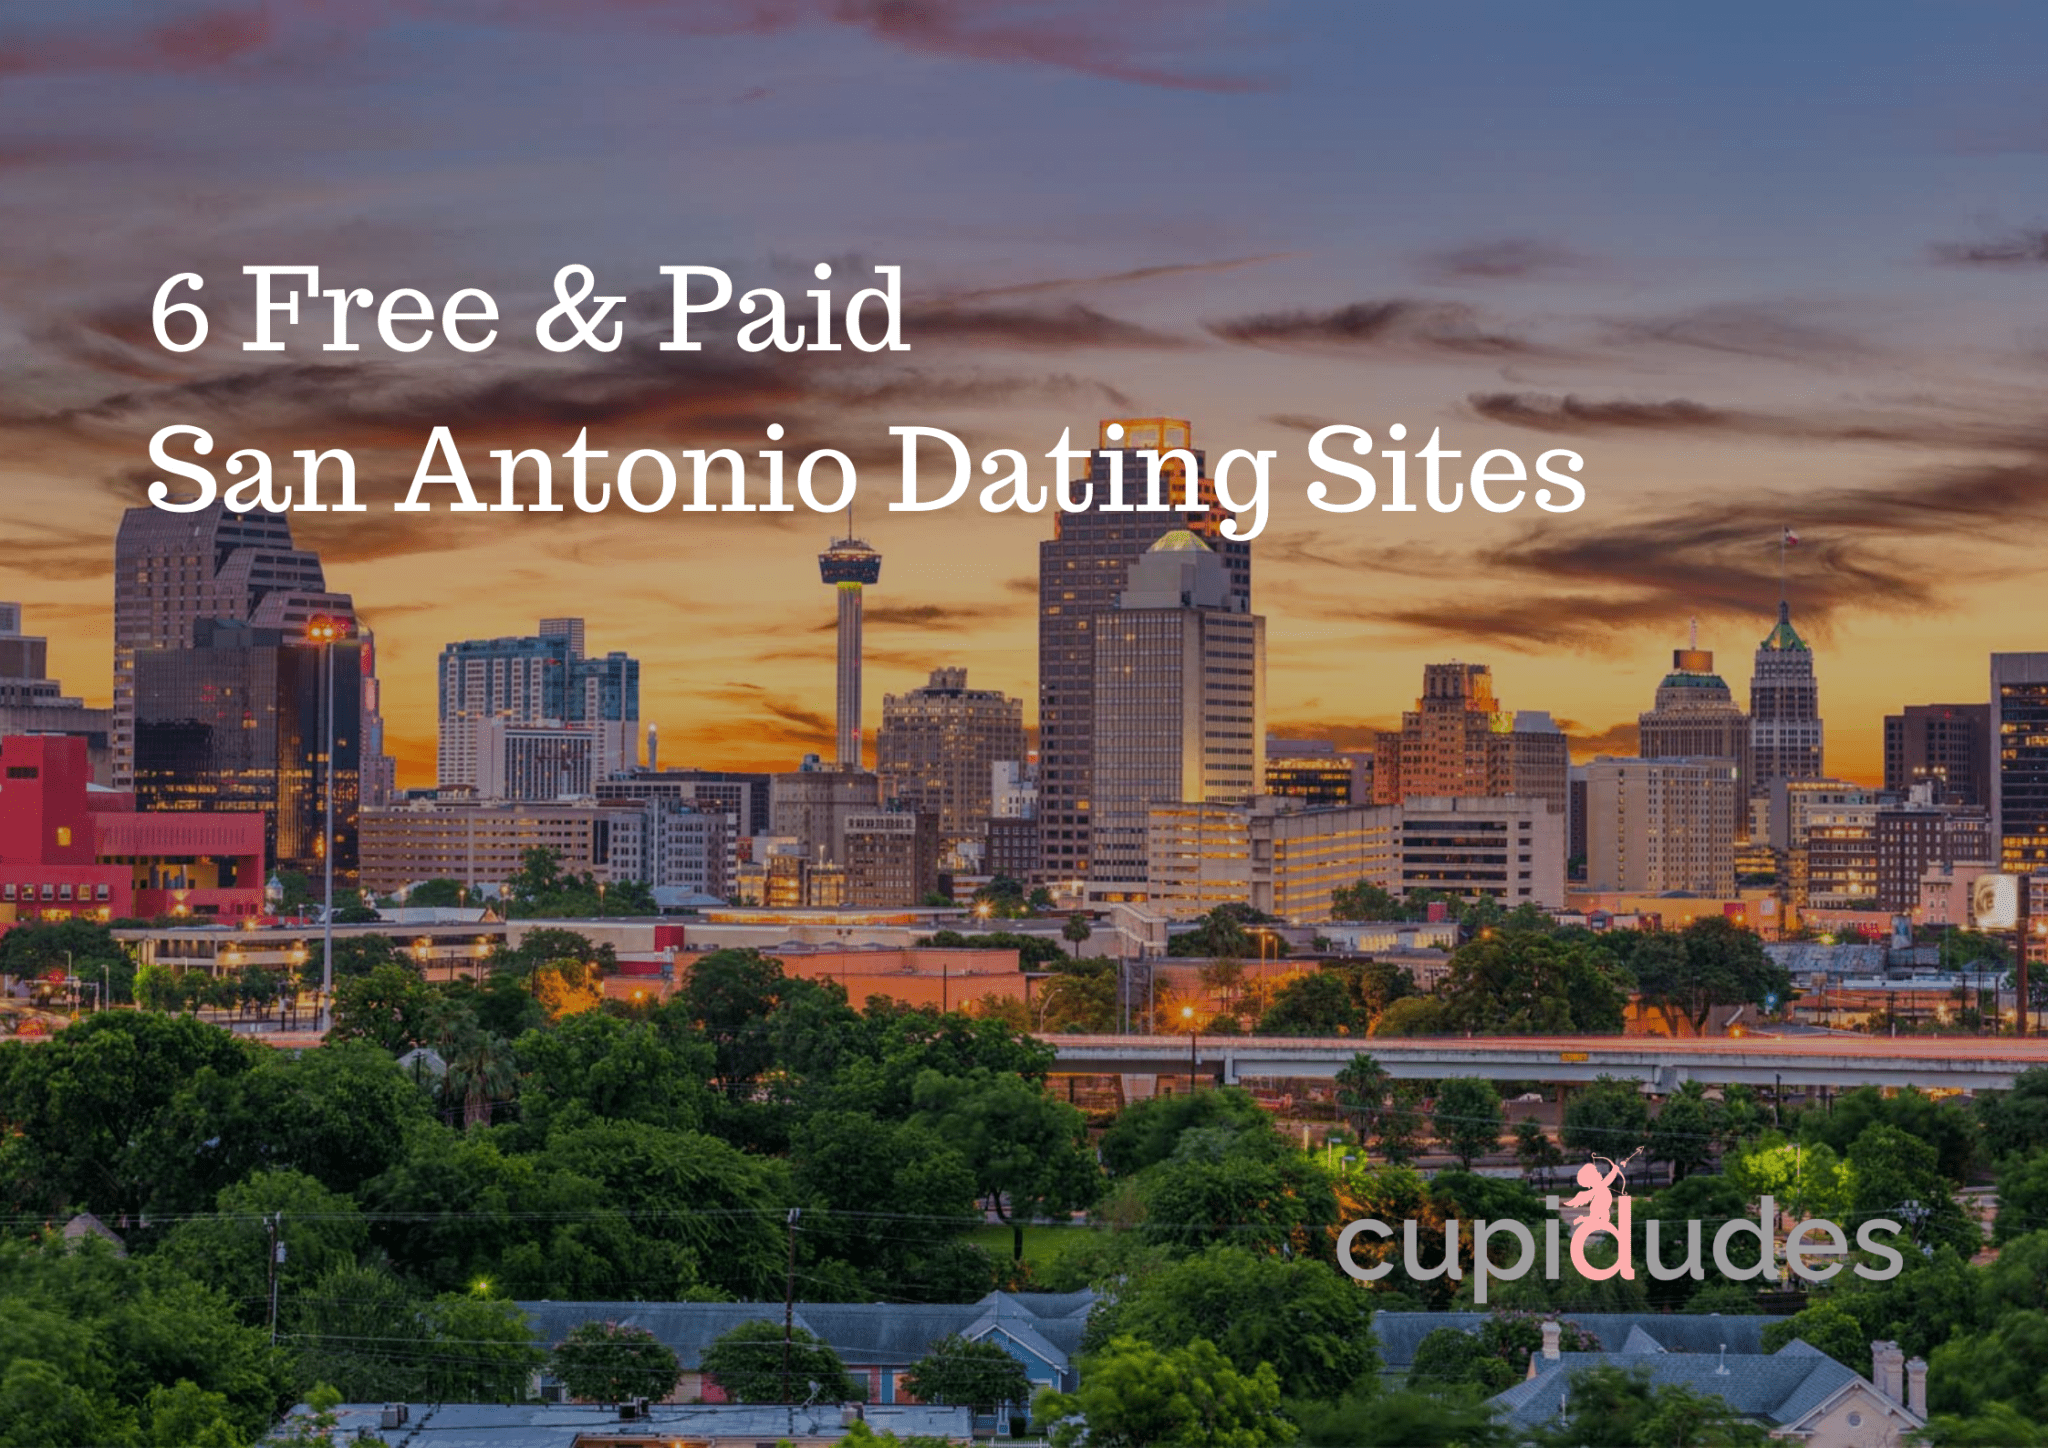 San Antonio Dating Sites